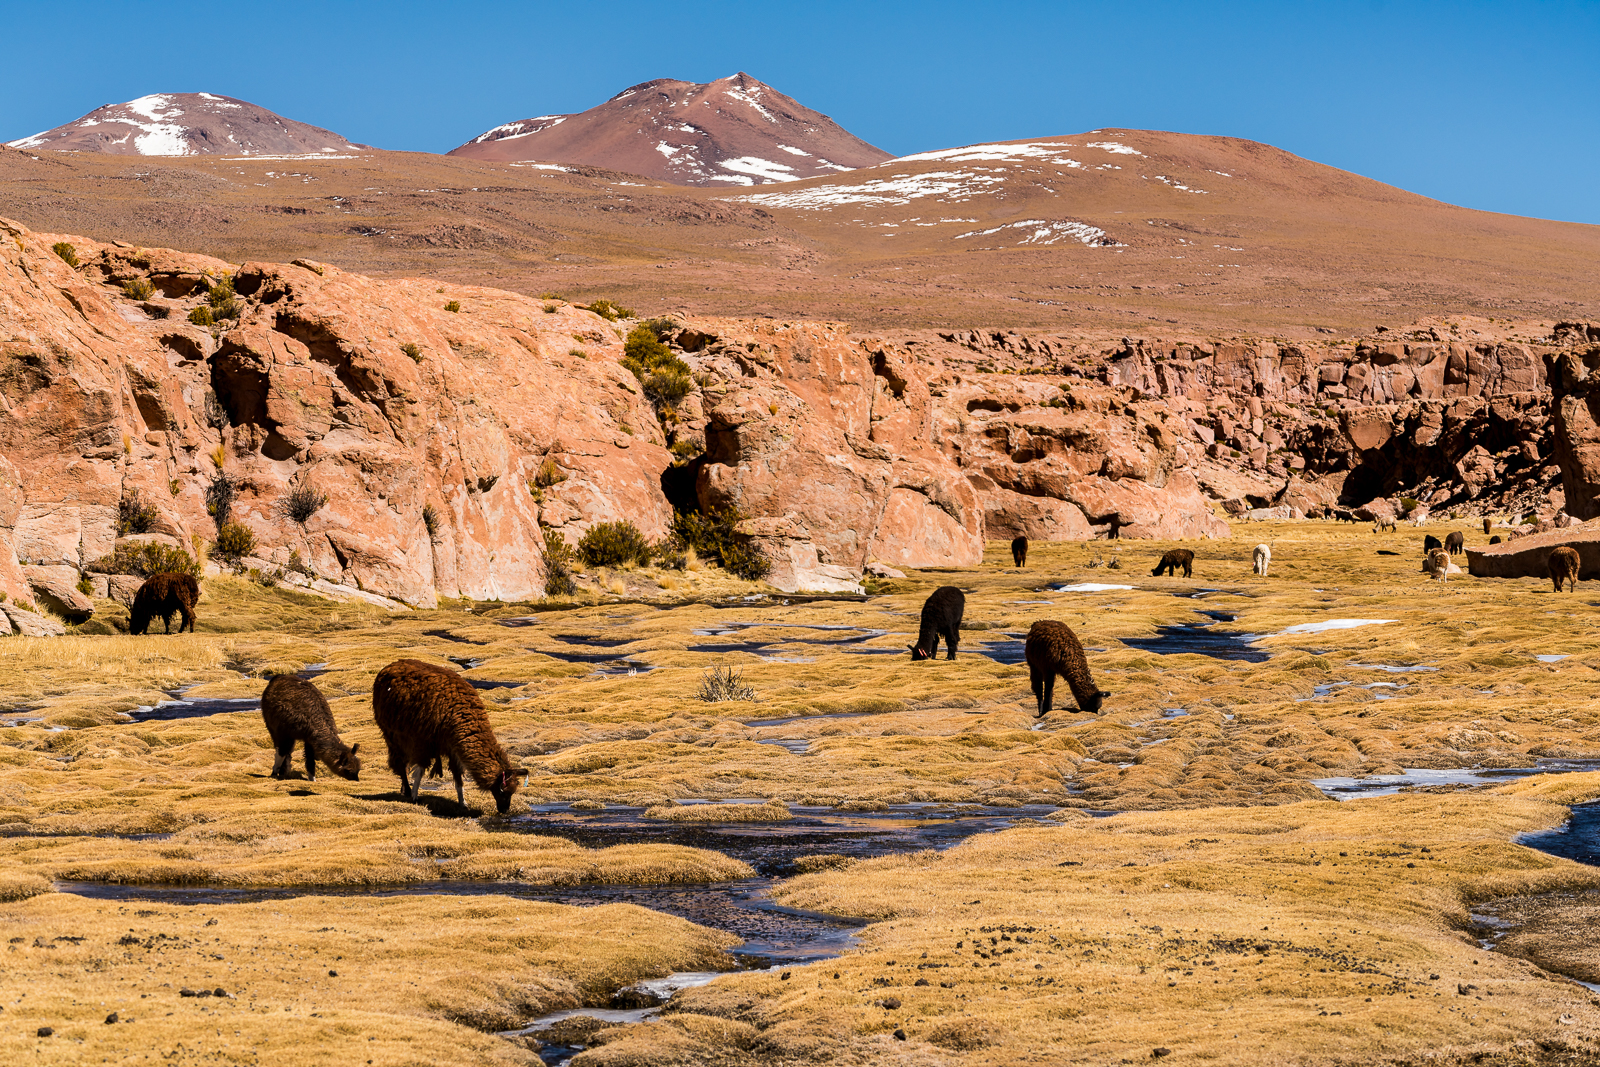 Lamas are seen everywhere